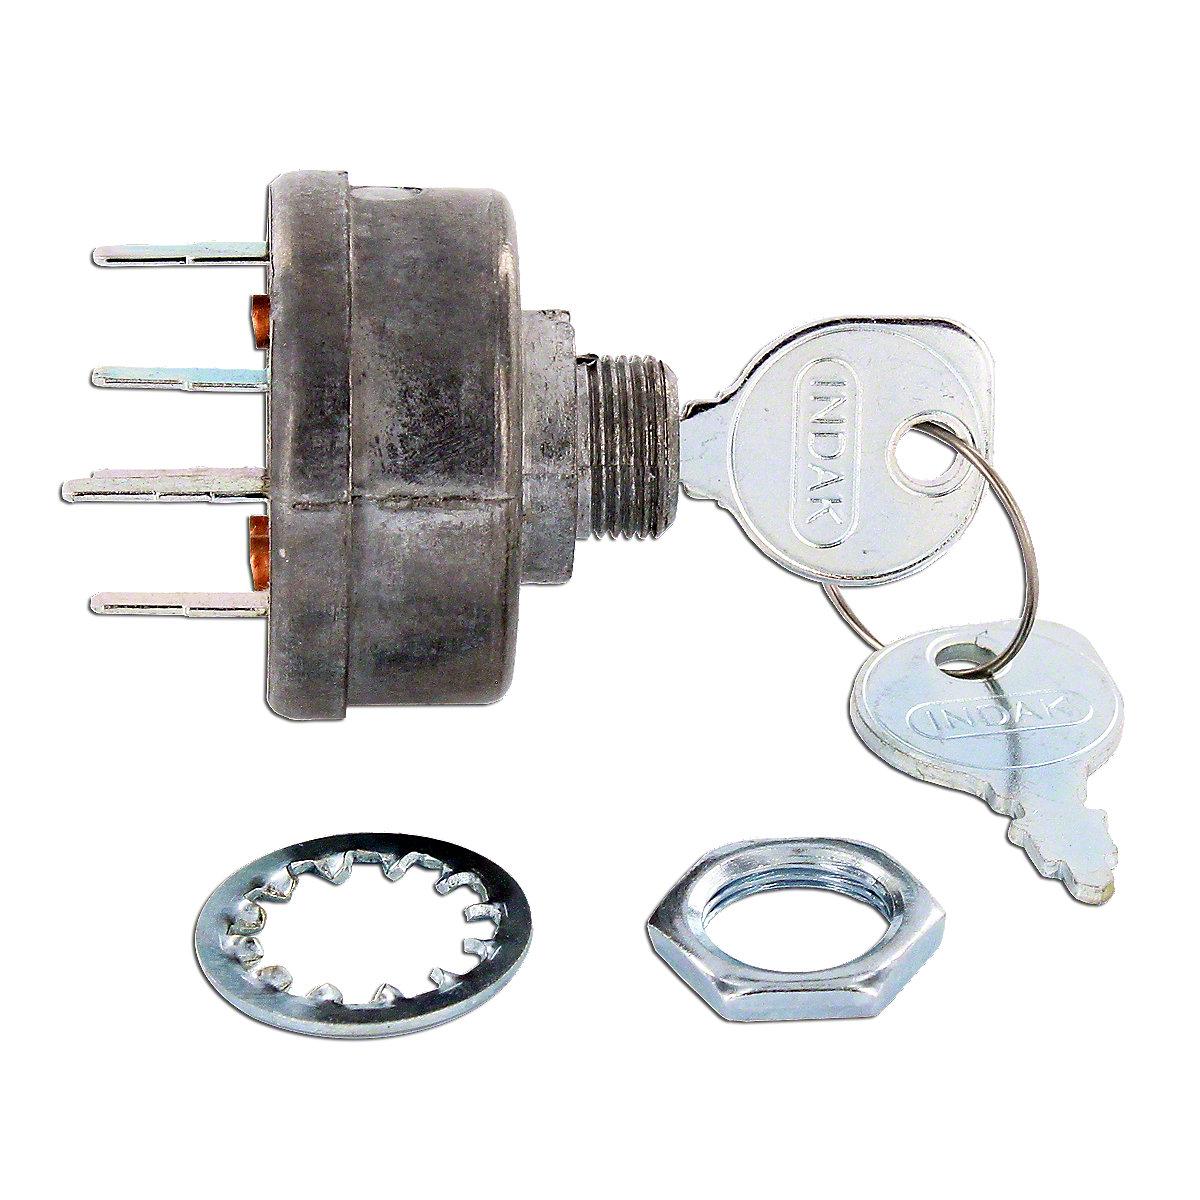 Ignition Switch With Keys For Allis Chalmers: 190XT, D10, D12, D15, D17.